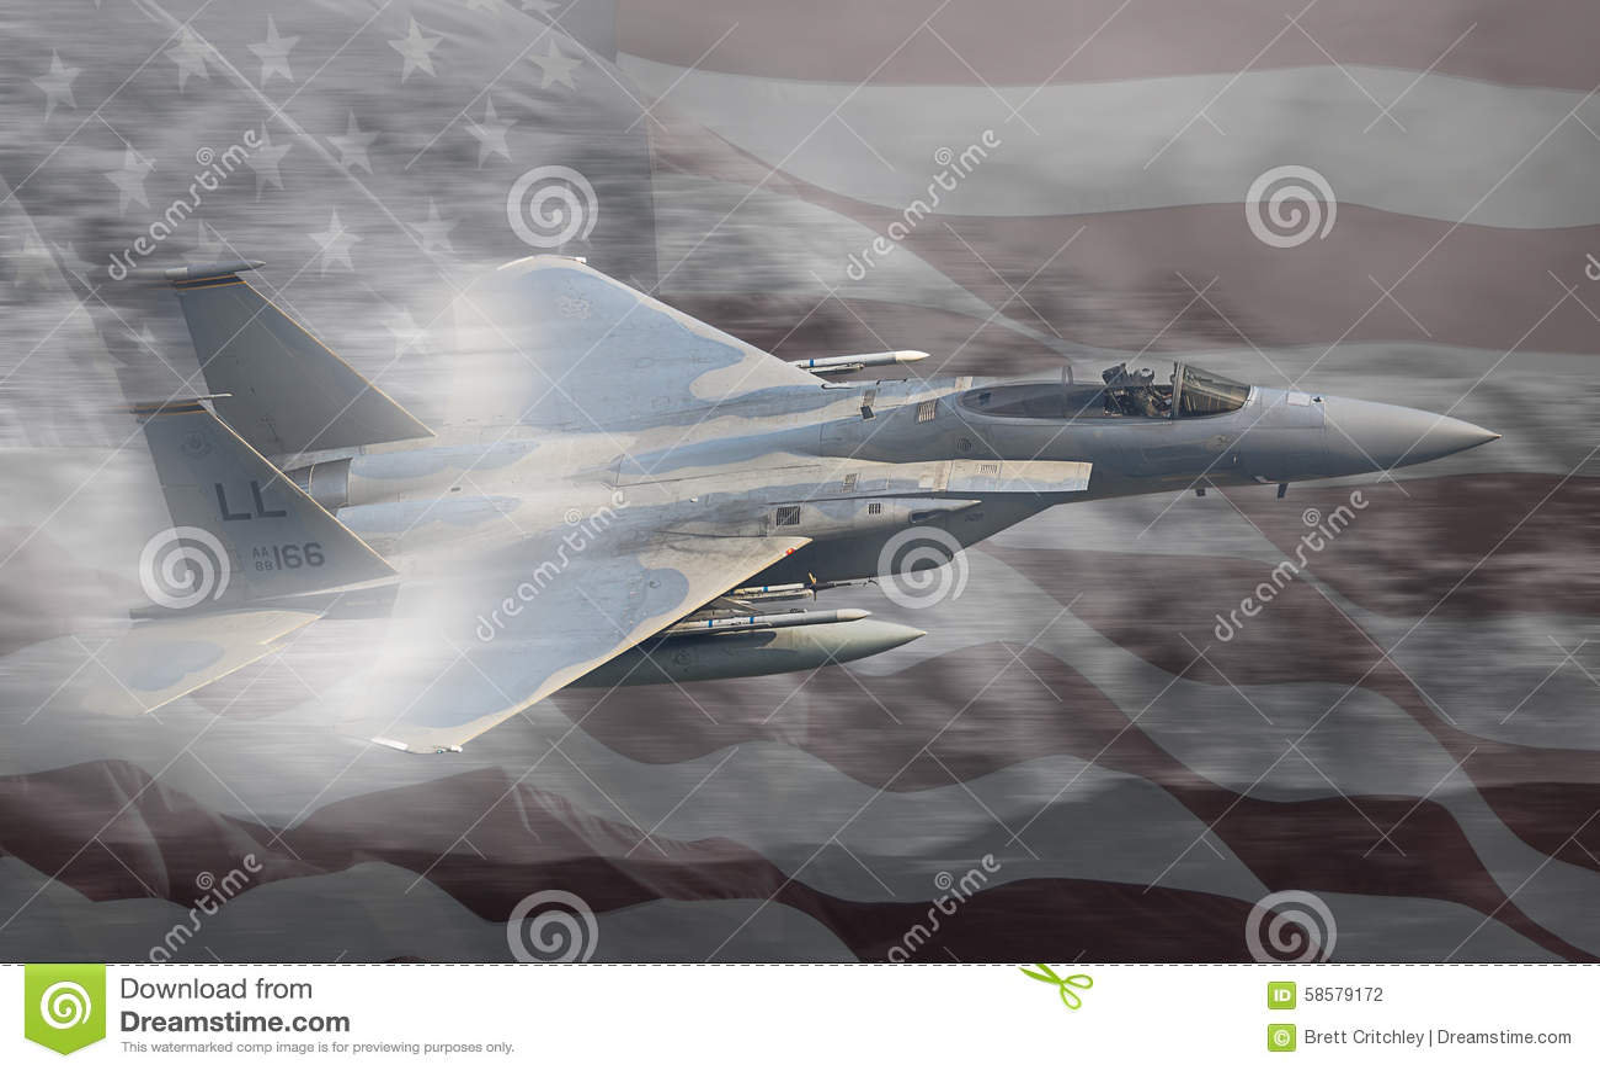 Jet de la fuerza aérea del U.S.A.F. Estados Unidos